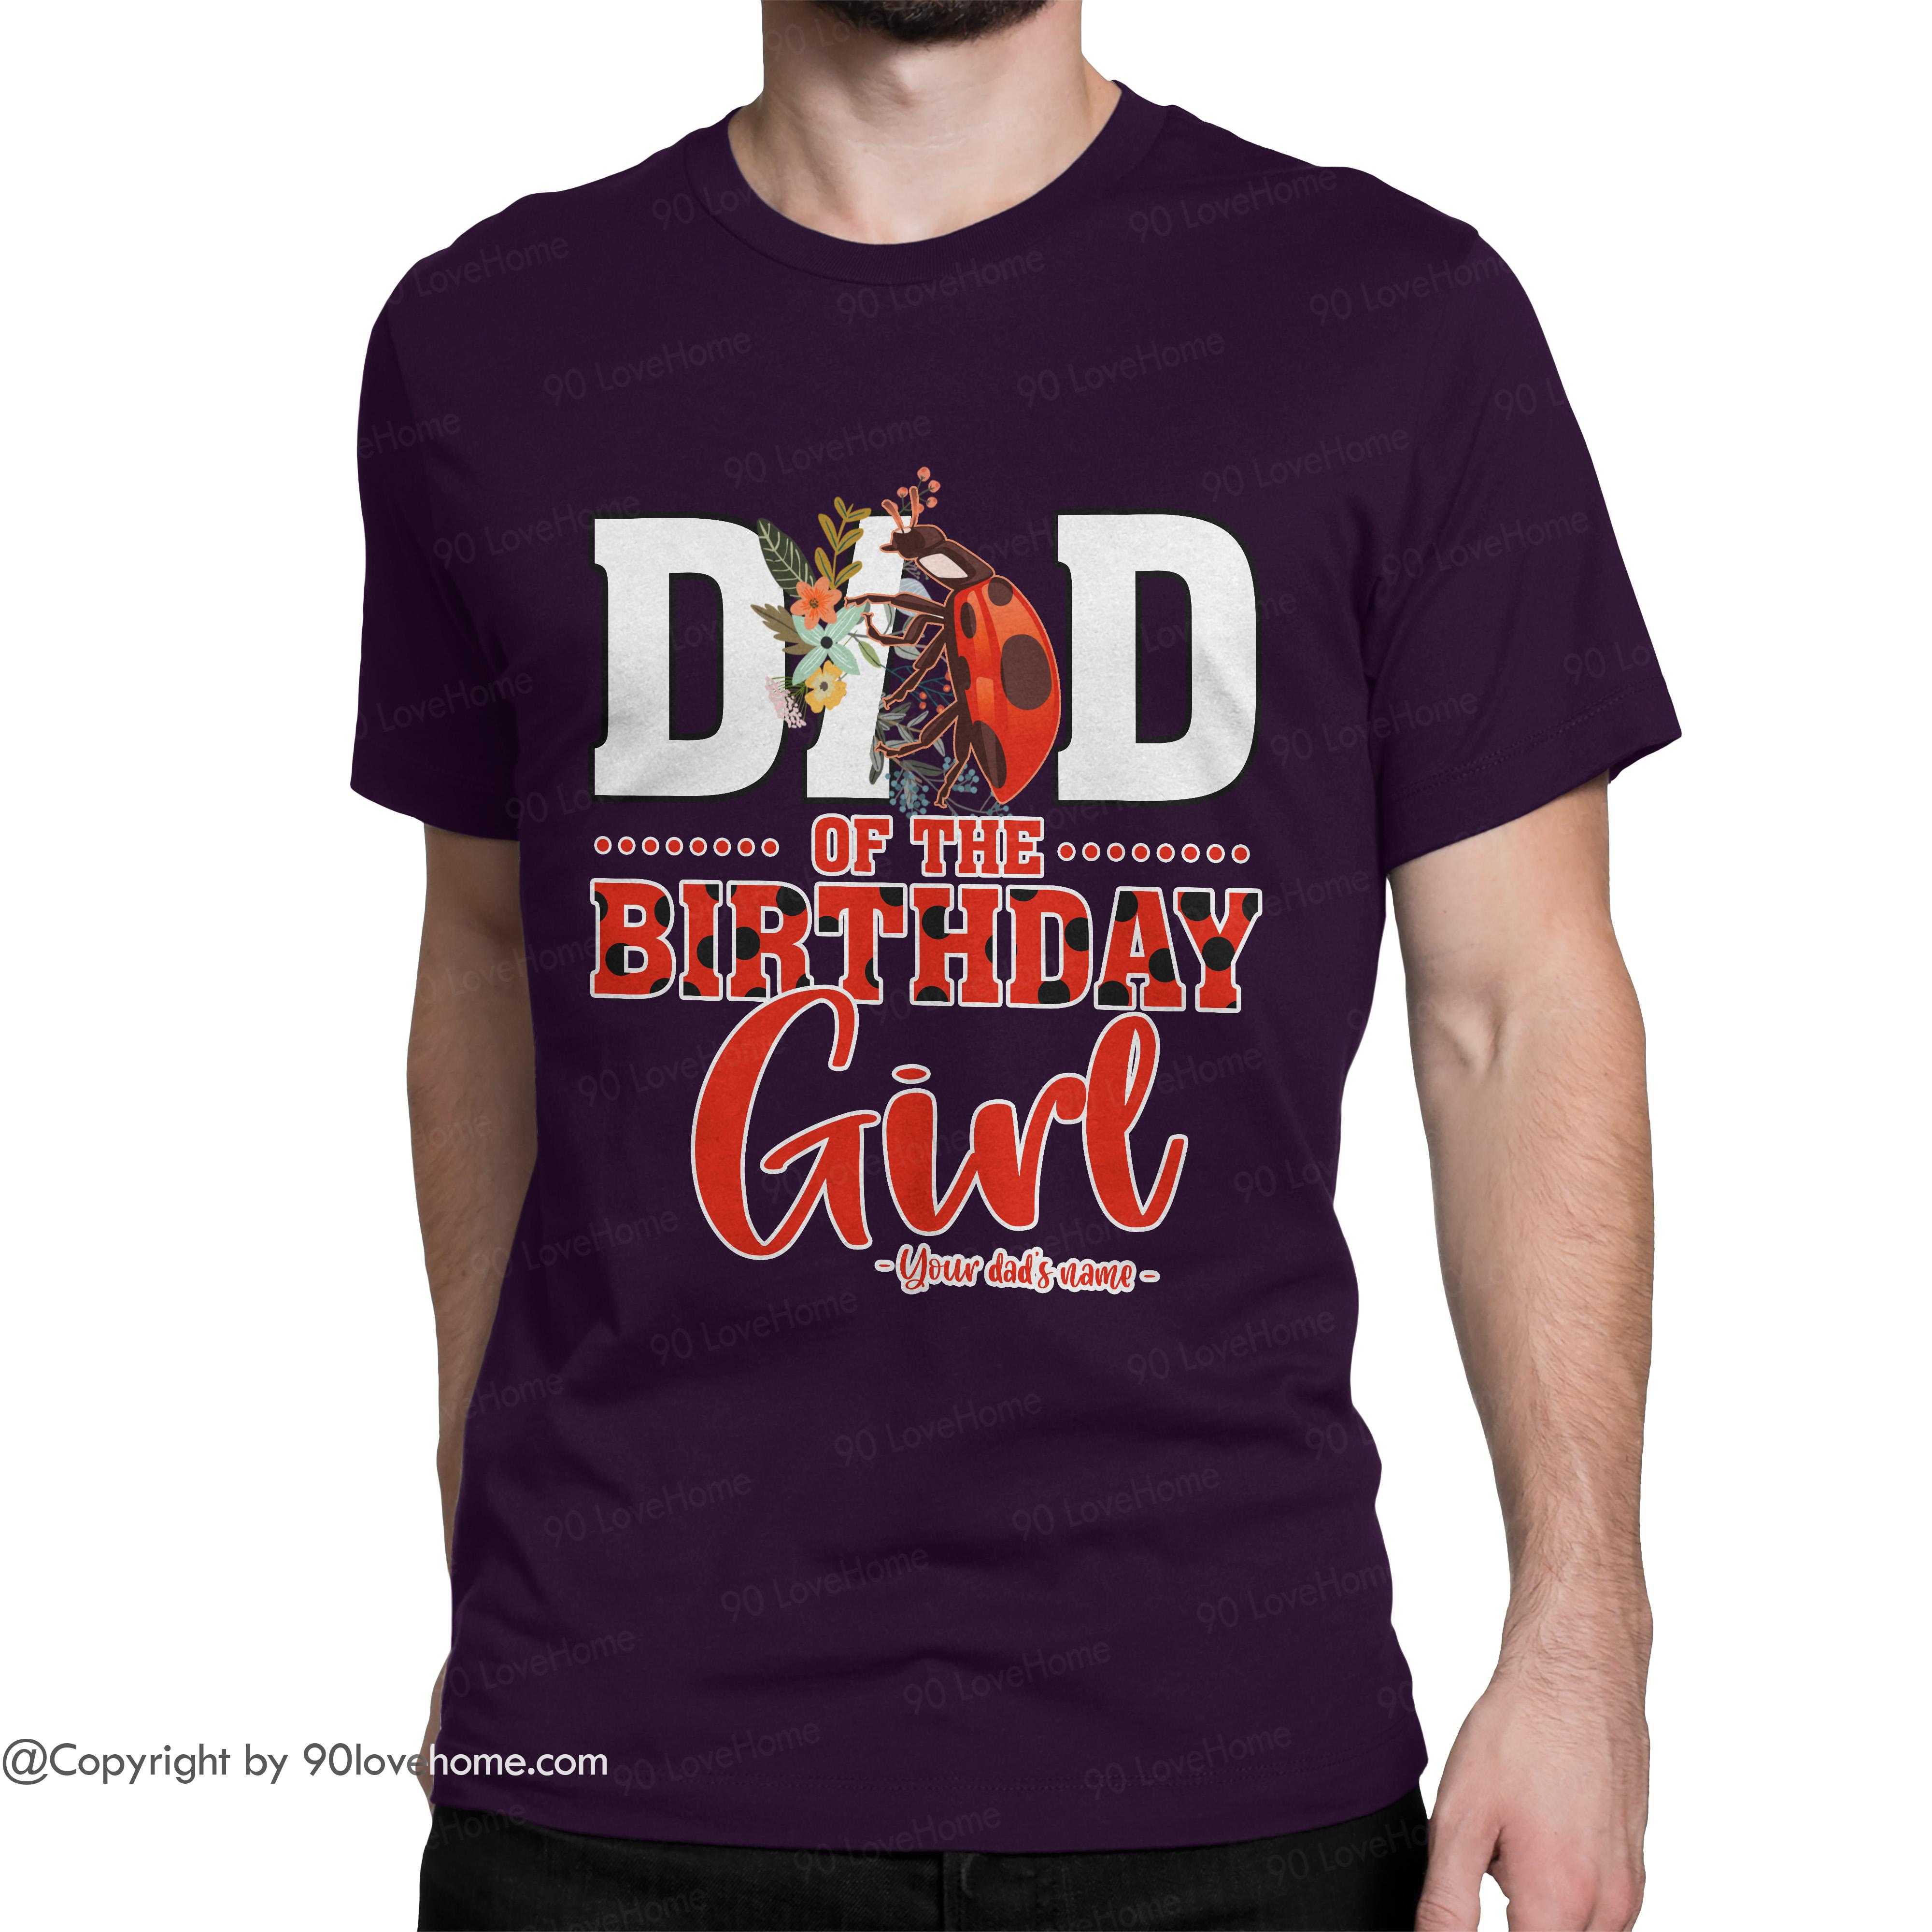 Customized Dad Of The Birthday Girl Ladybug Unisex T-shirt Ladybug Girl Dad Tee Father's Day Birthday Gift For Dad 90LoveHome